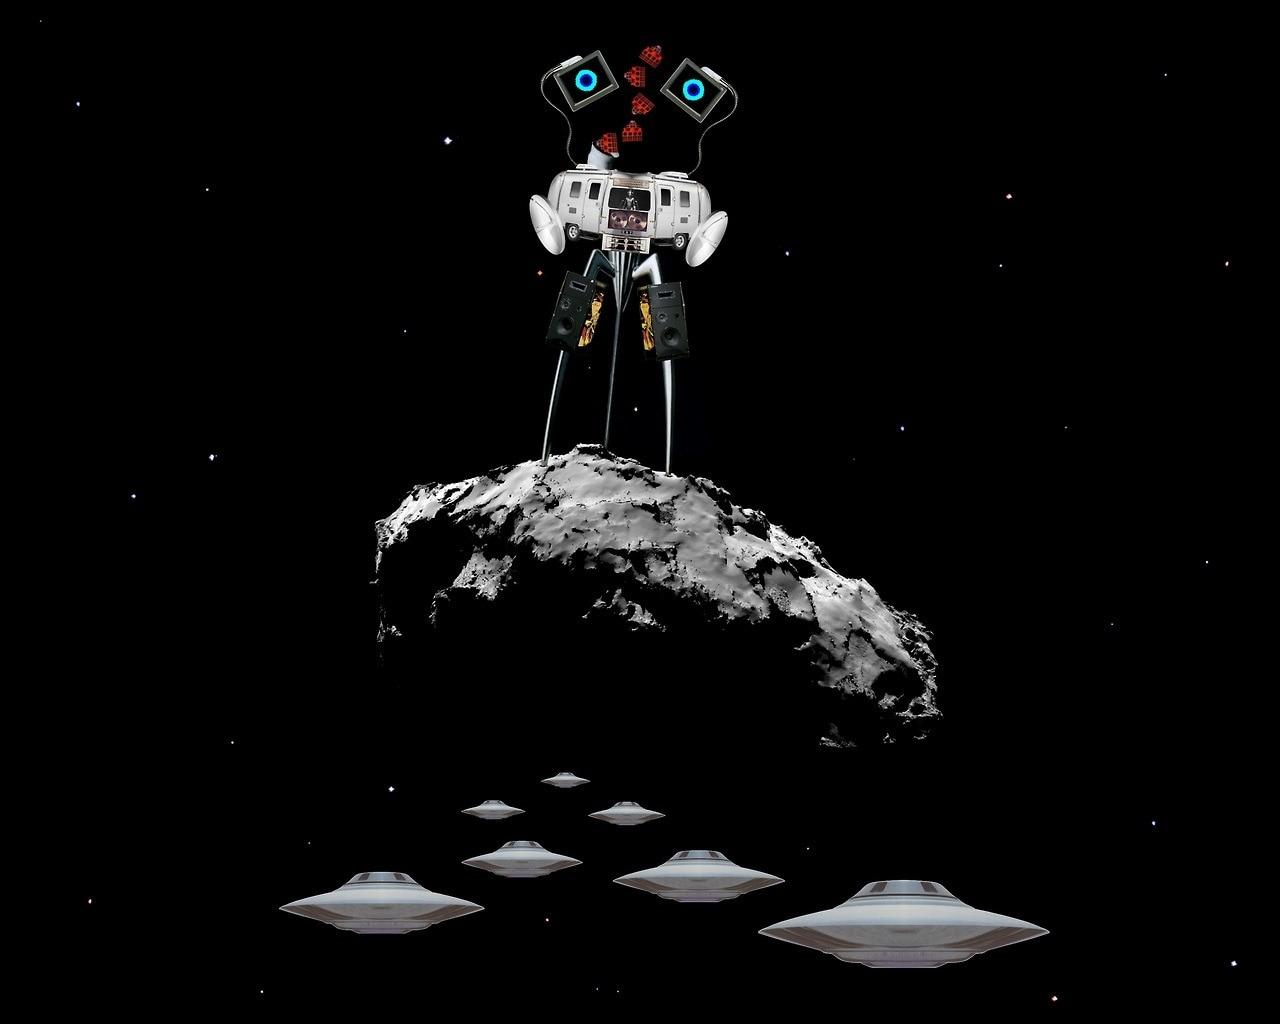 Радио VOYAGER Alien Sci-Fi научная фантастика Ретро винтажный крафт-постер декоративная стена стикер Холст Картина домашний Декор подарок